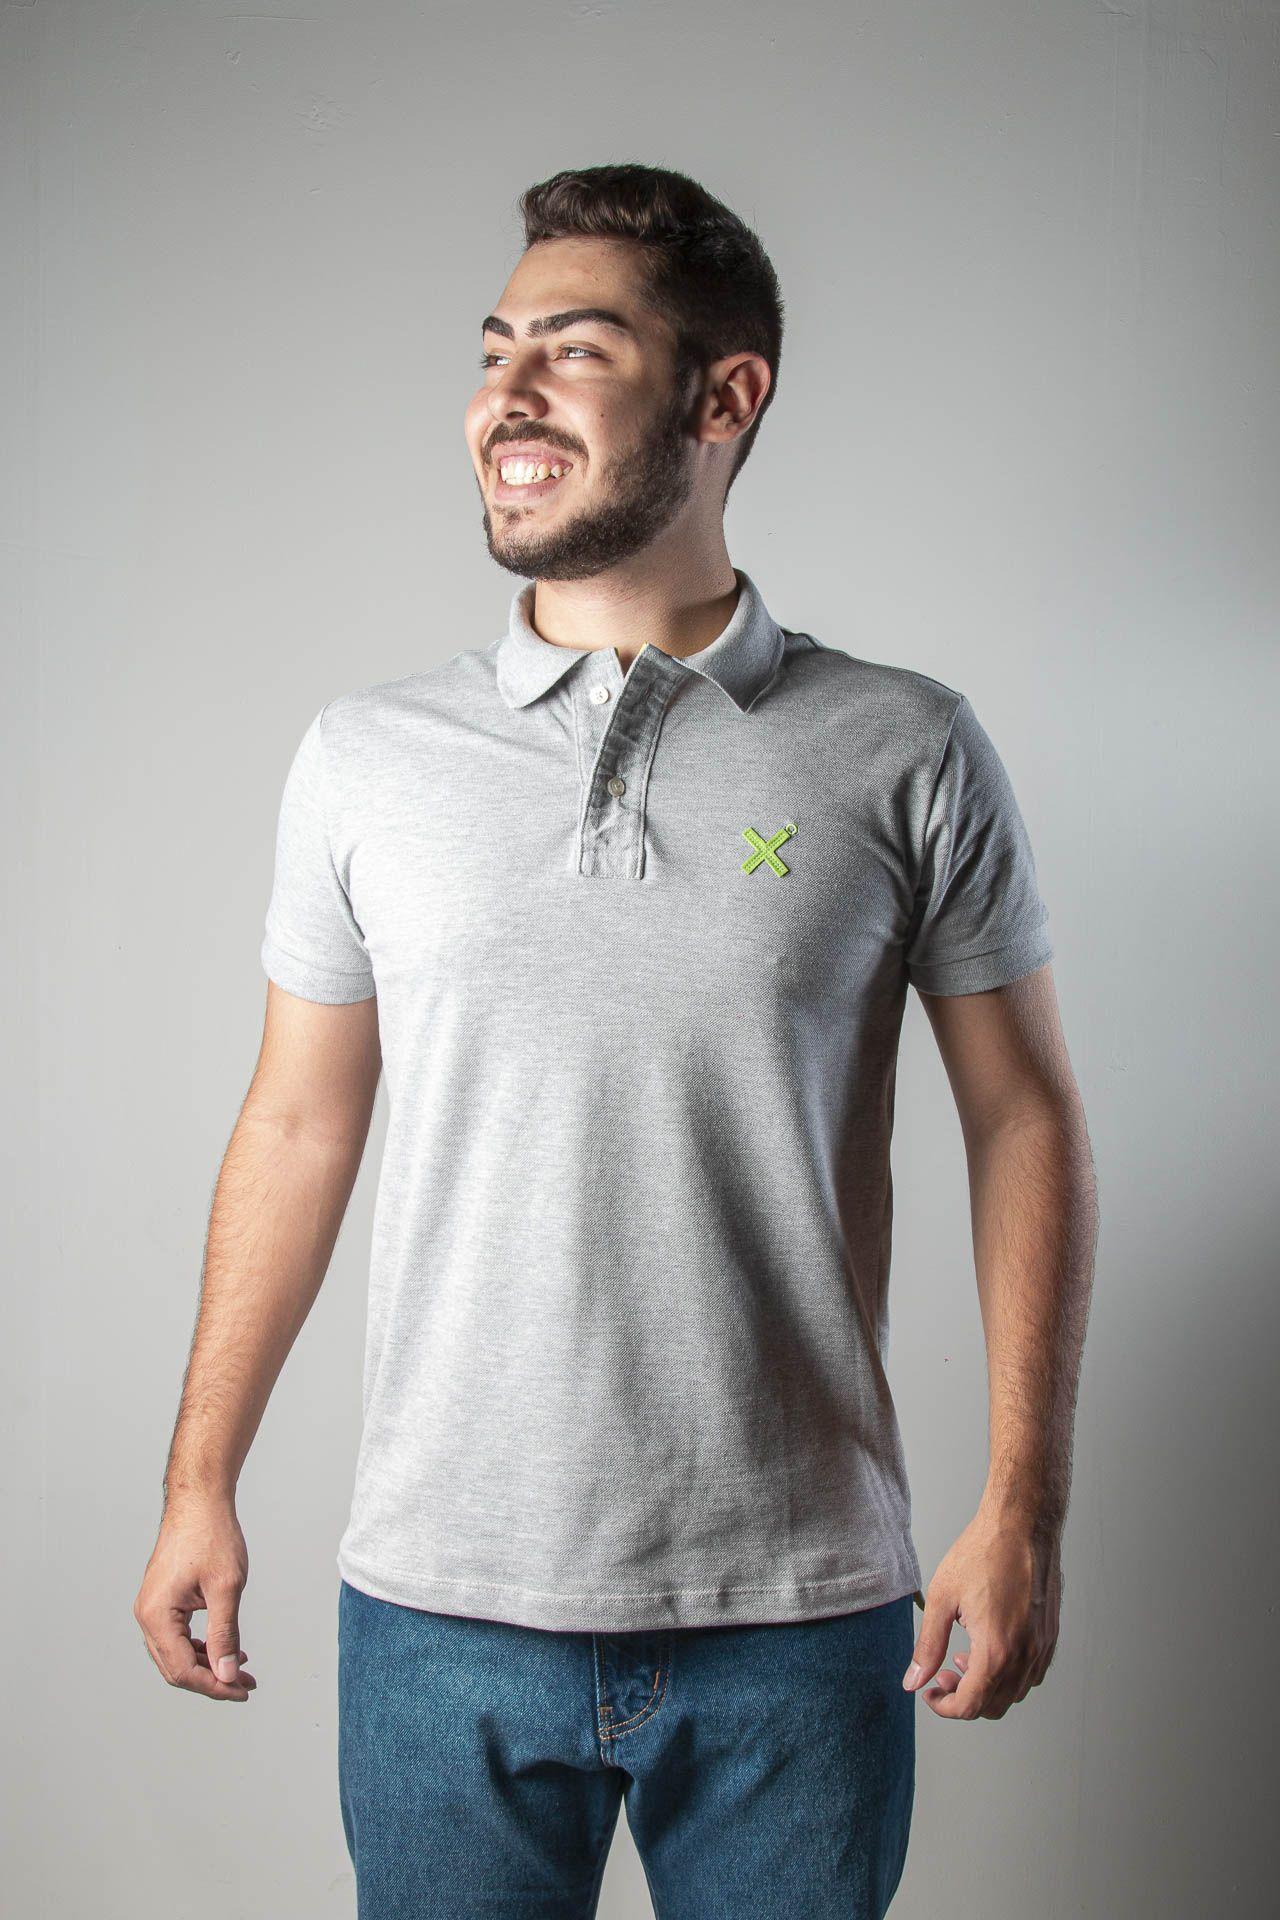 Camiseta Masculina Txc Gola Polo Algodão Mescla - Cinza Claro